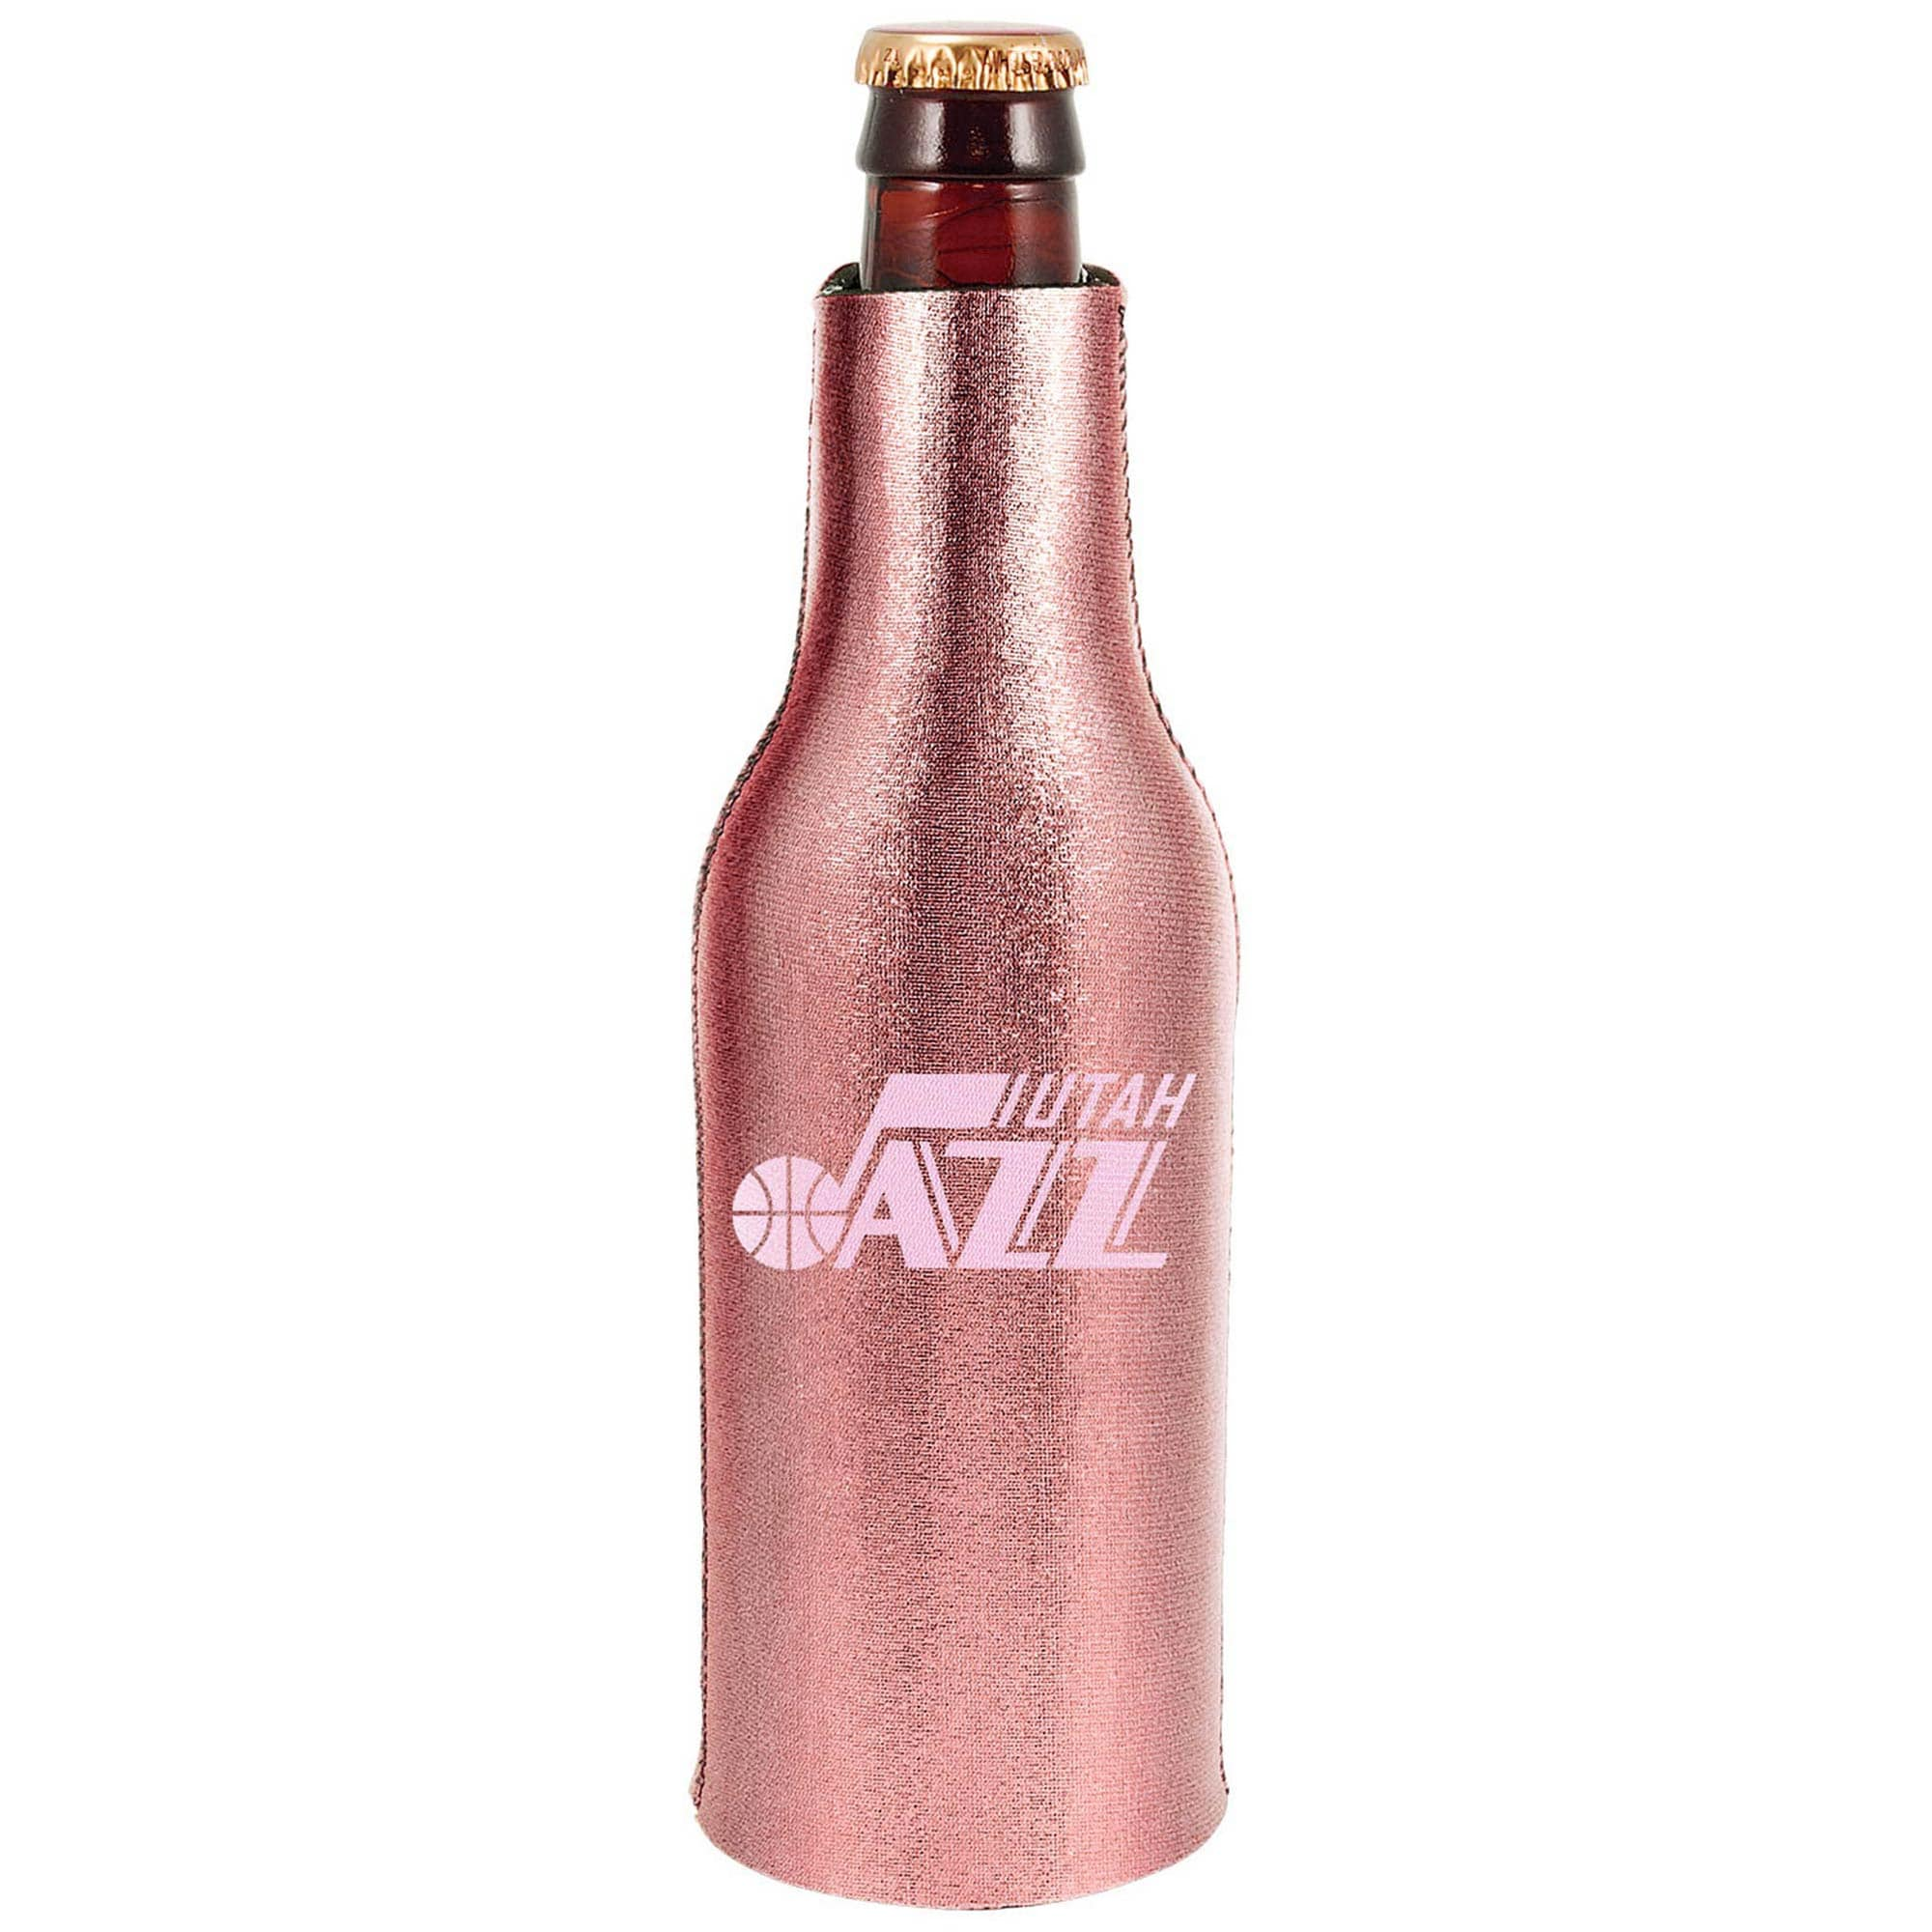 Utah Jazz 12oz. Rose Gold Bottle Cooler